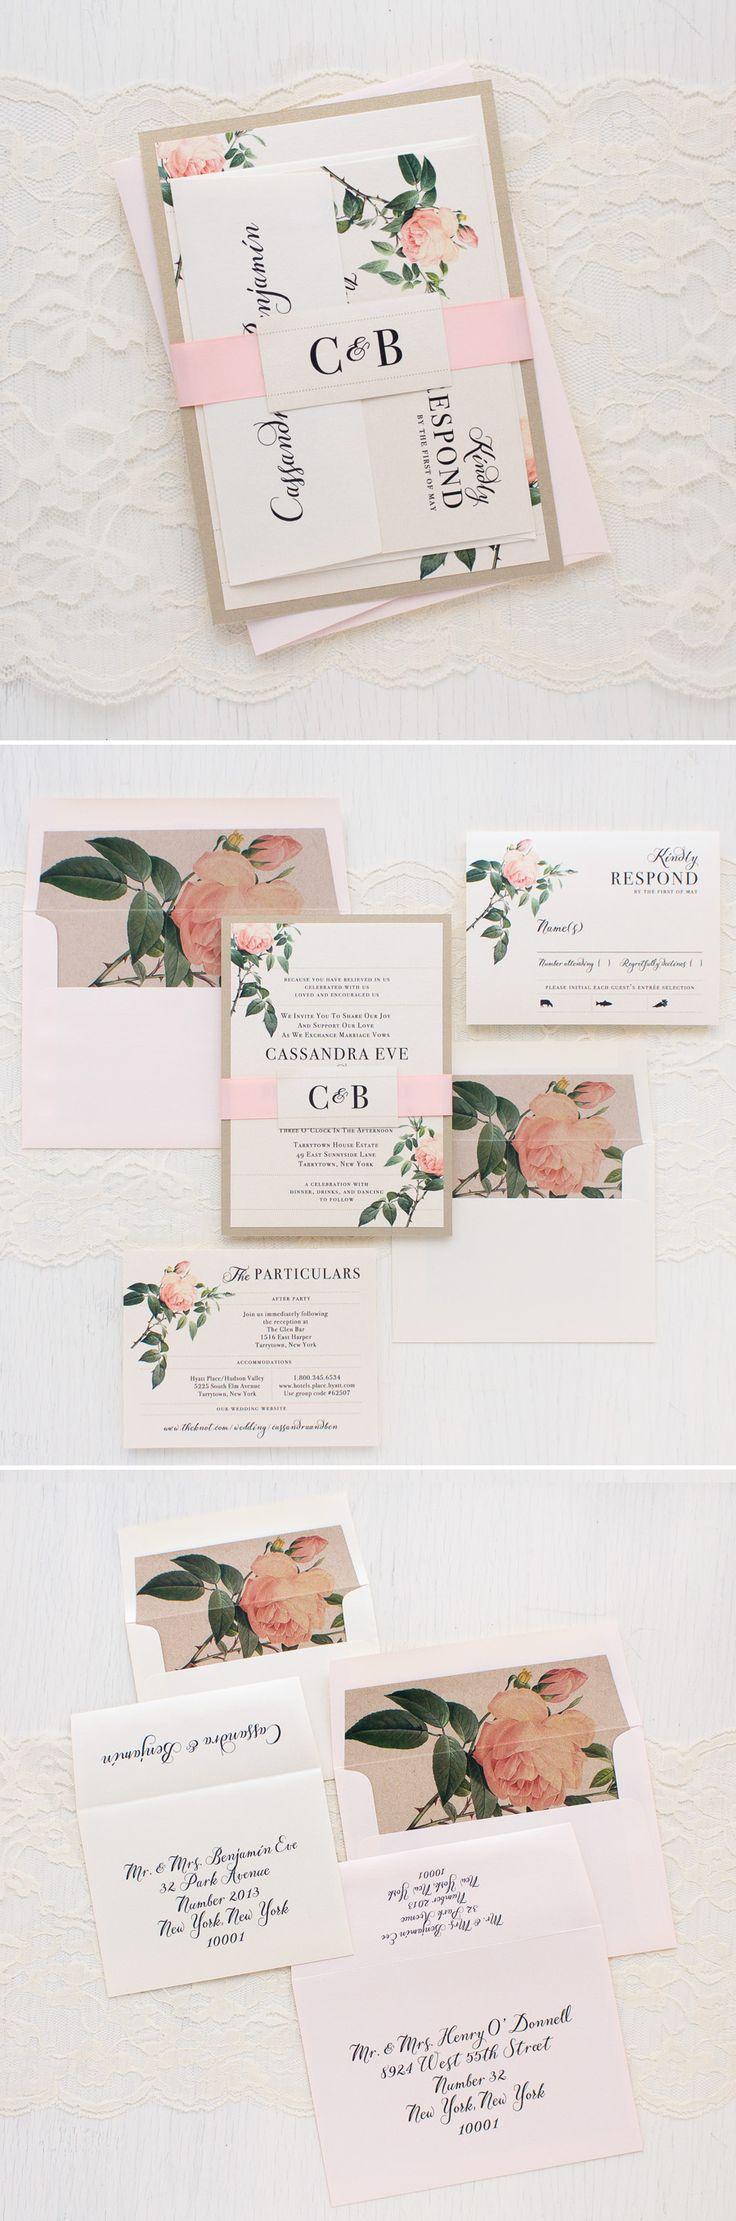 Best 25+ Garden wedding invitations ideas on Pinterest | Wedding ...